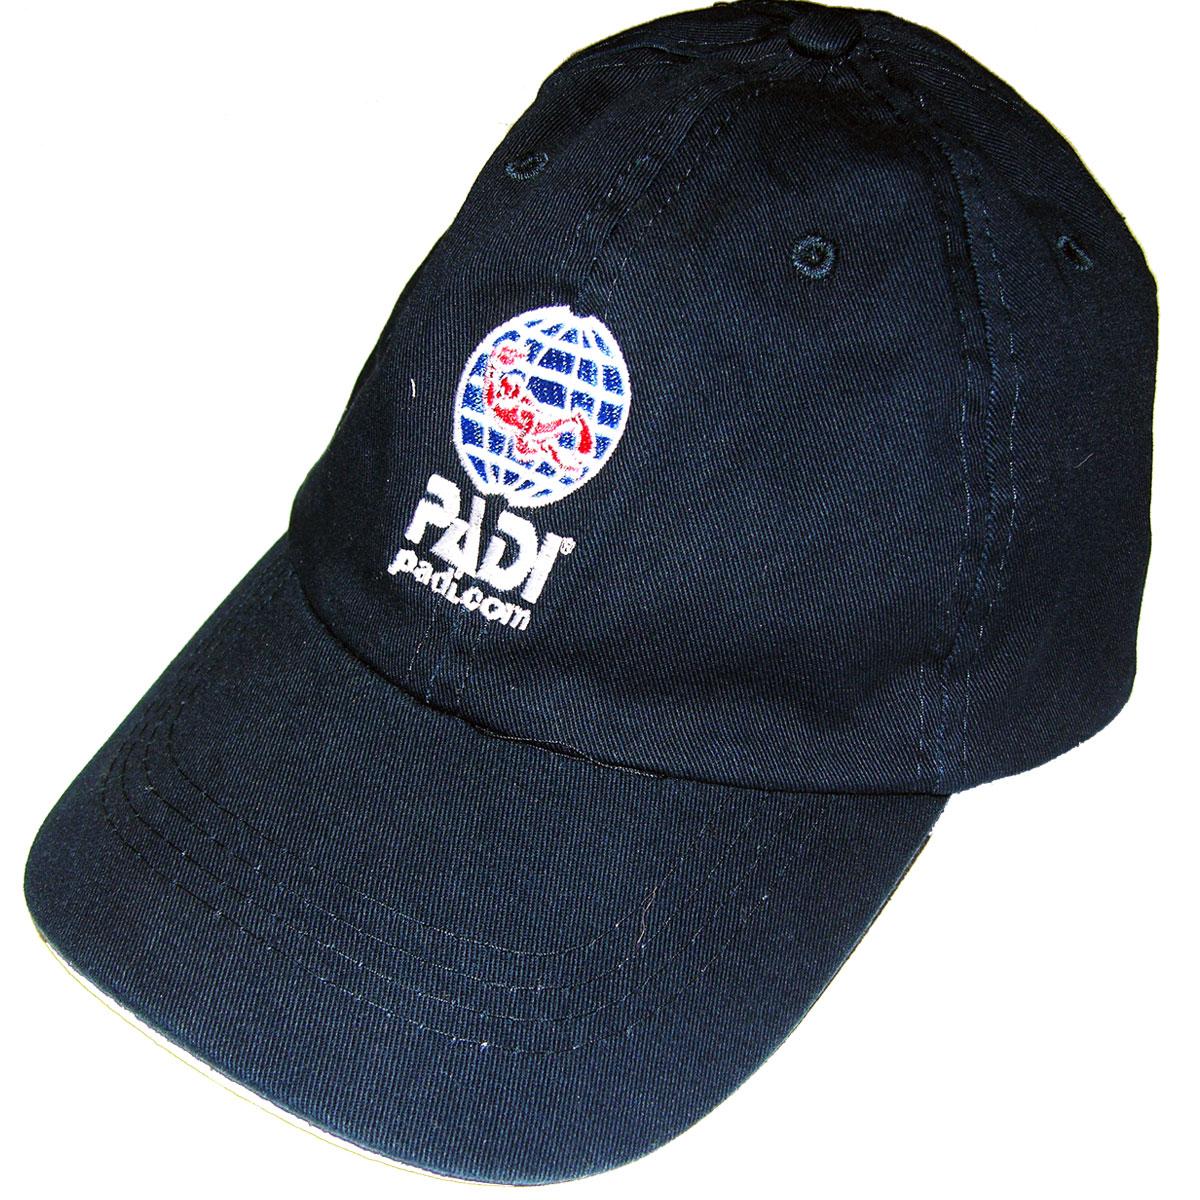 PADI - Hat Divemaster black Universal